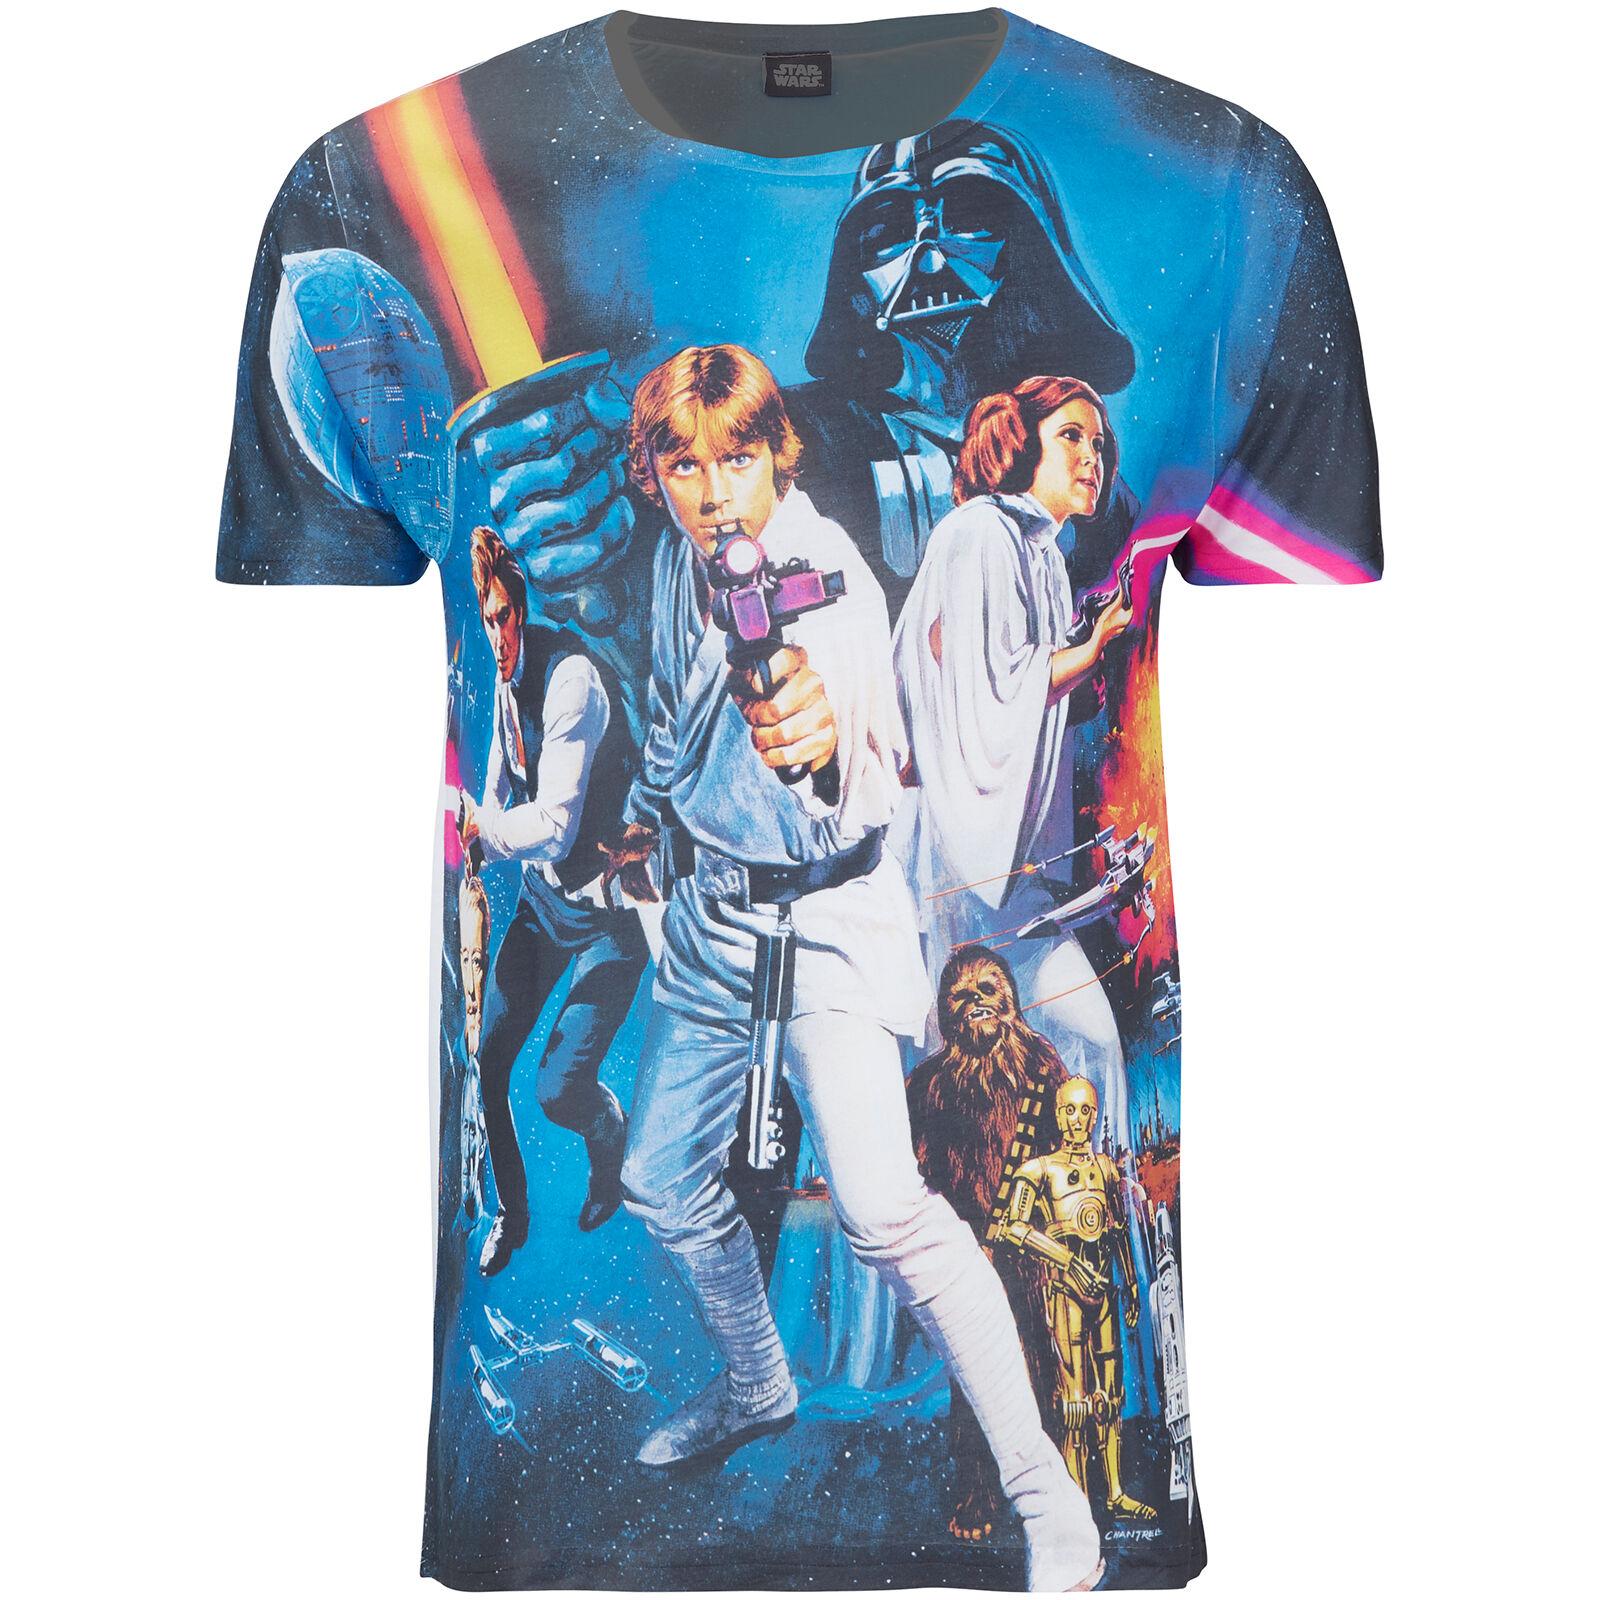 Geek Clothing Star Wars Men's Classic Poster T-Shirt - Black - M - Black